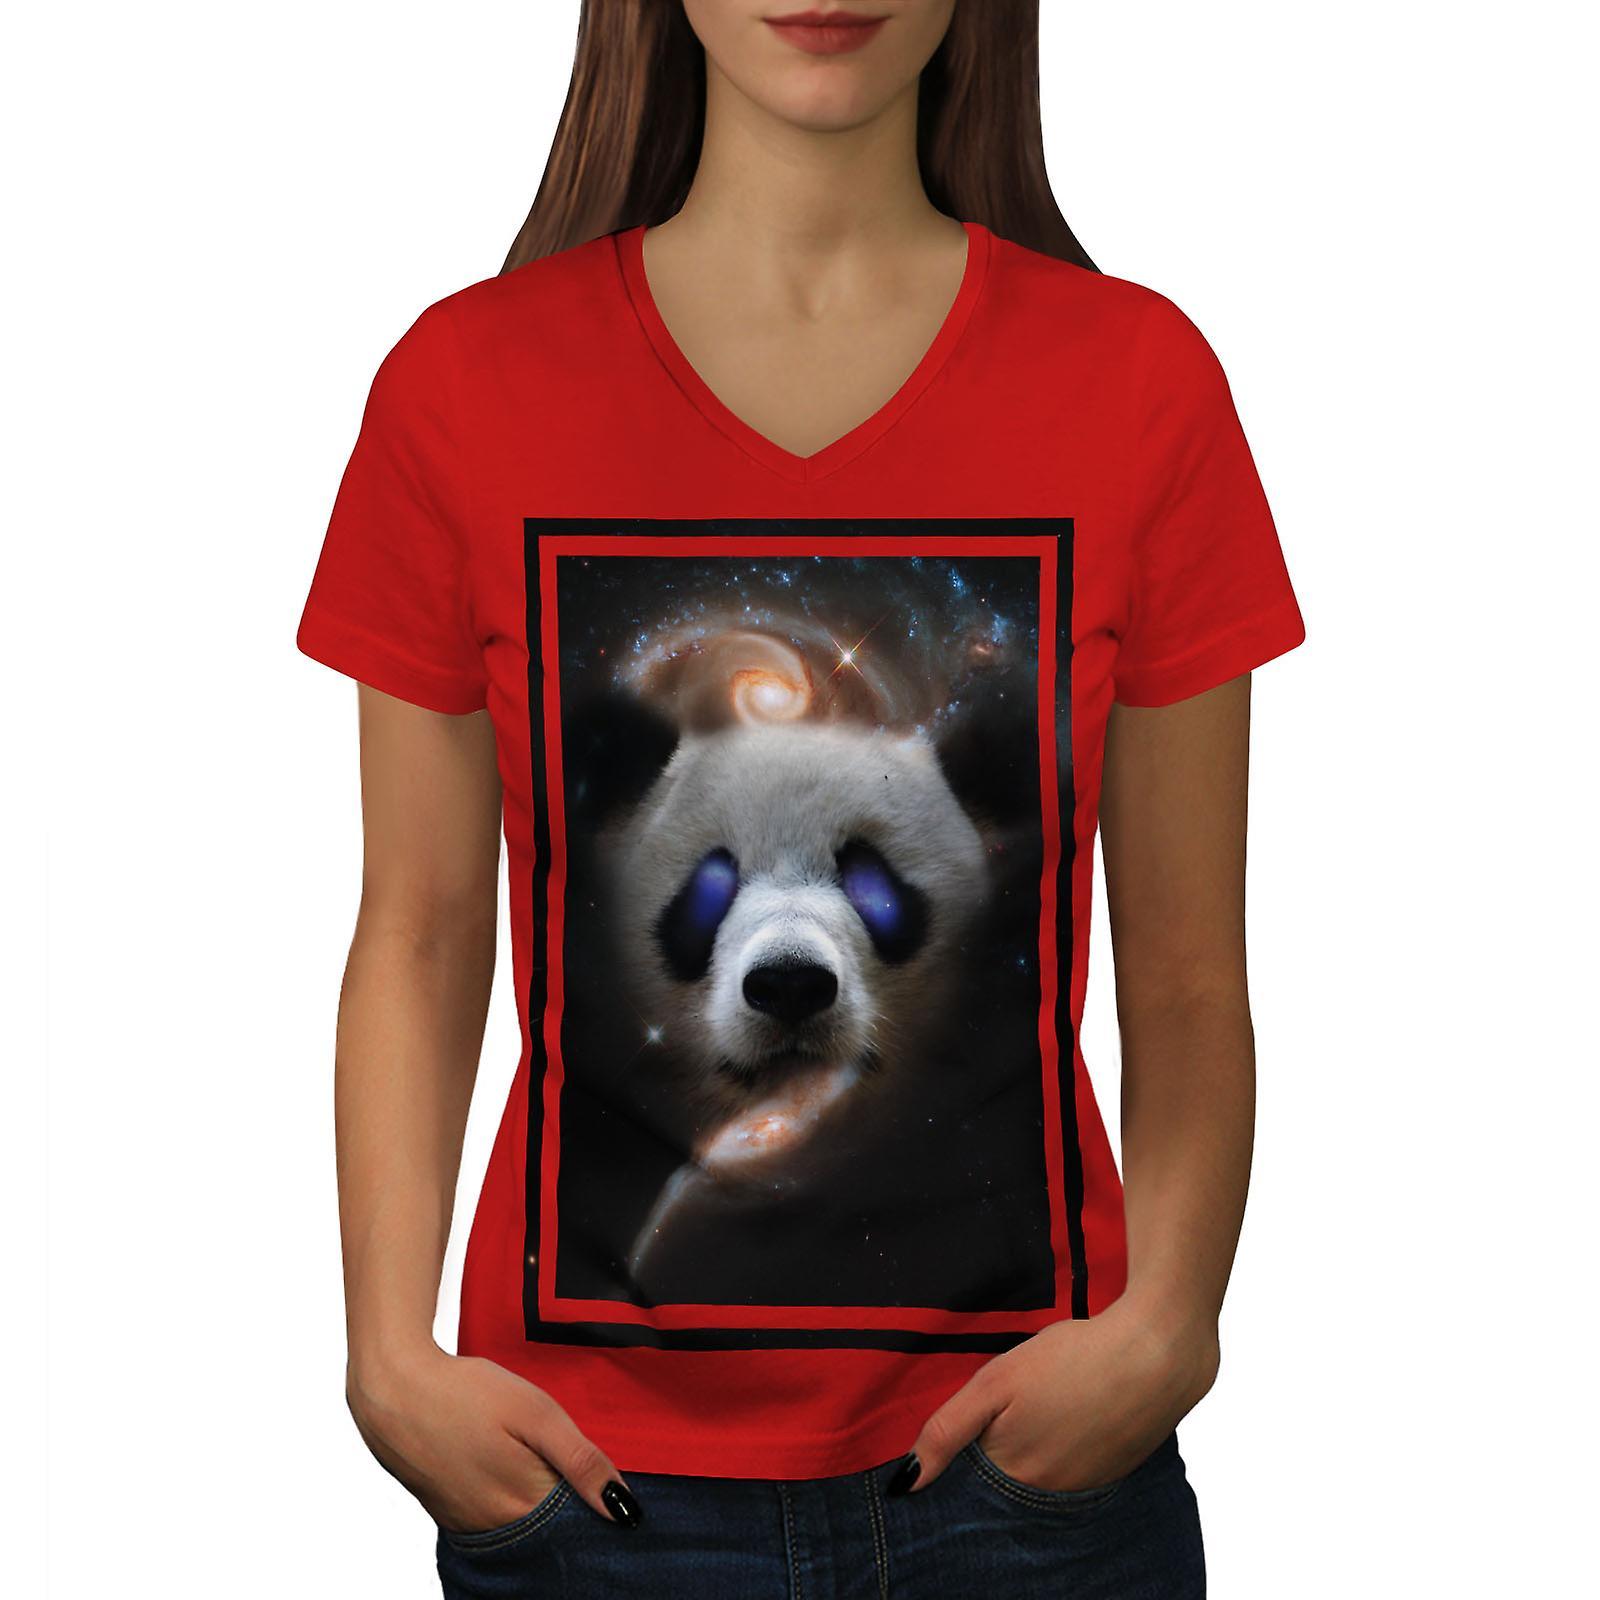 Panda Galaxy visage femmes animaux RedV-Neck T-shirt | Wellcoda